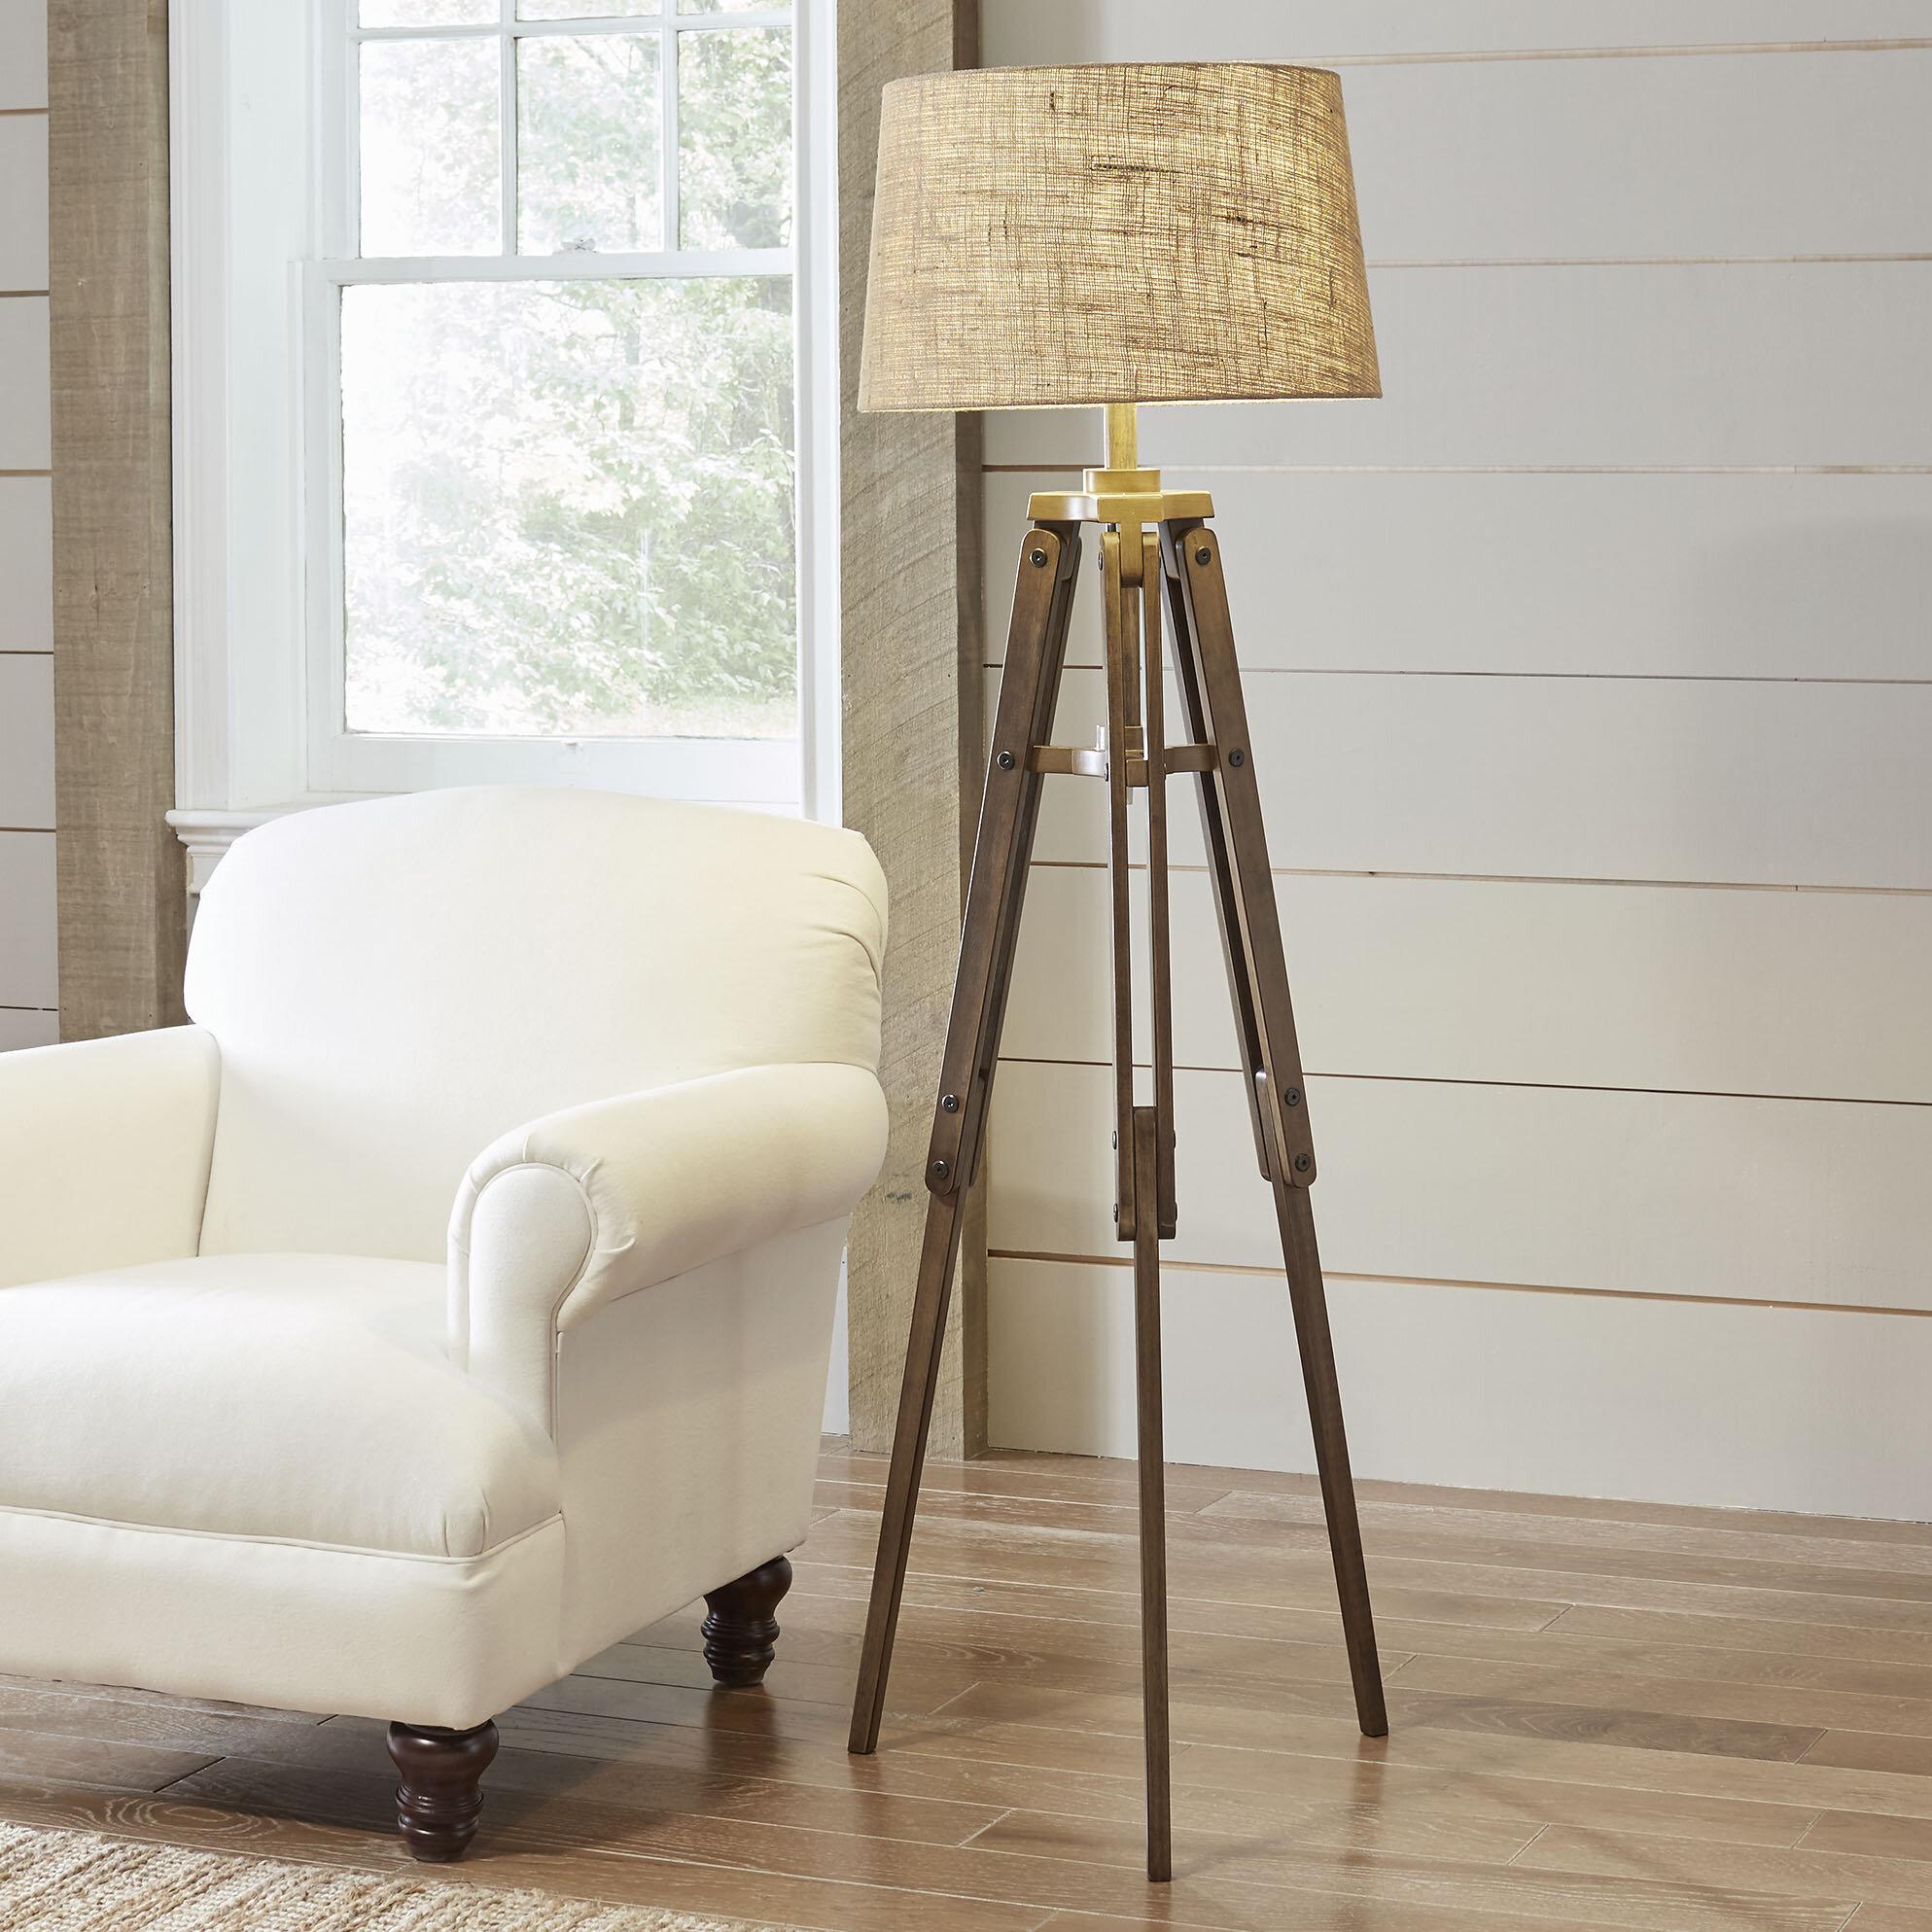 Rosalind Wheeler Lukes 62 25 Tripod Floor Lamp Reviews Wayfair